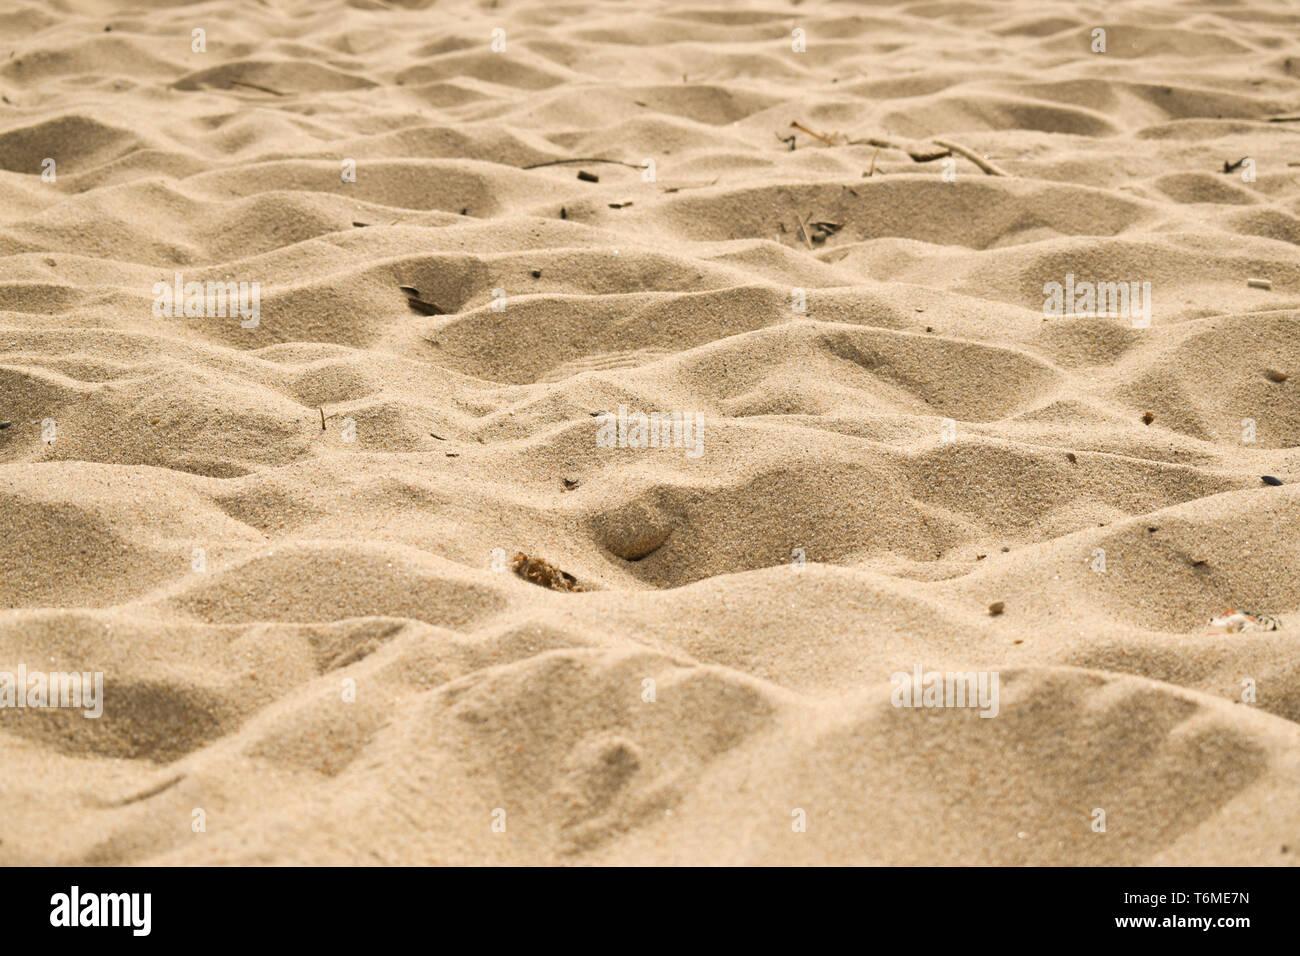 Clean beach sand. - Stock Image